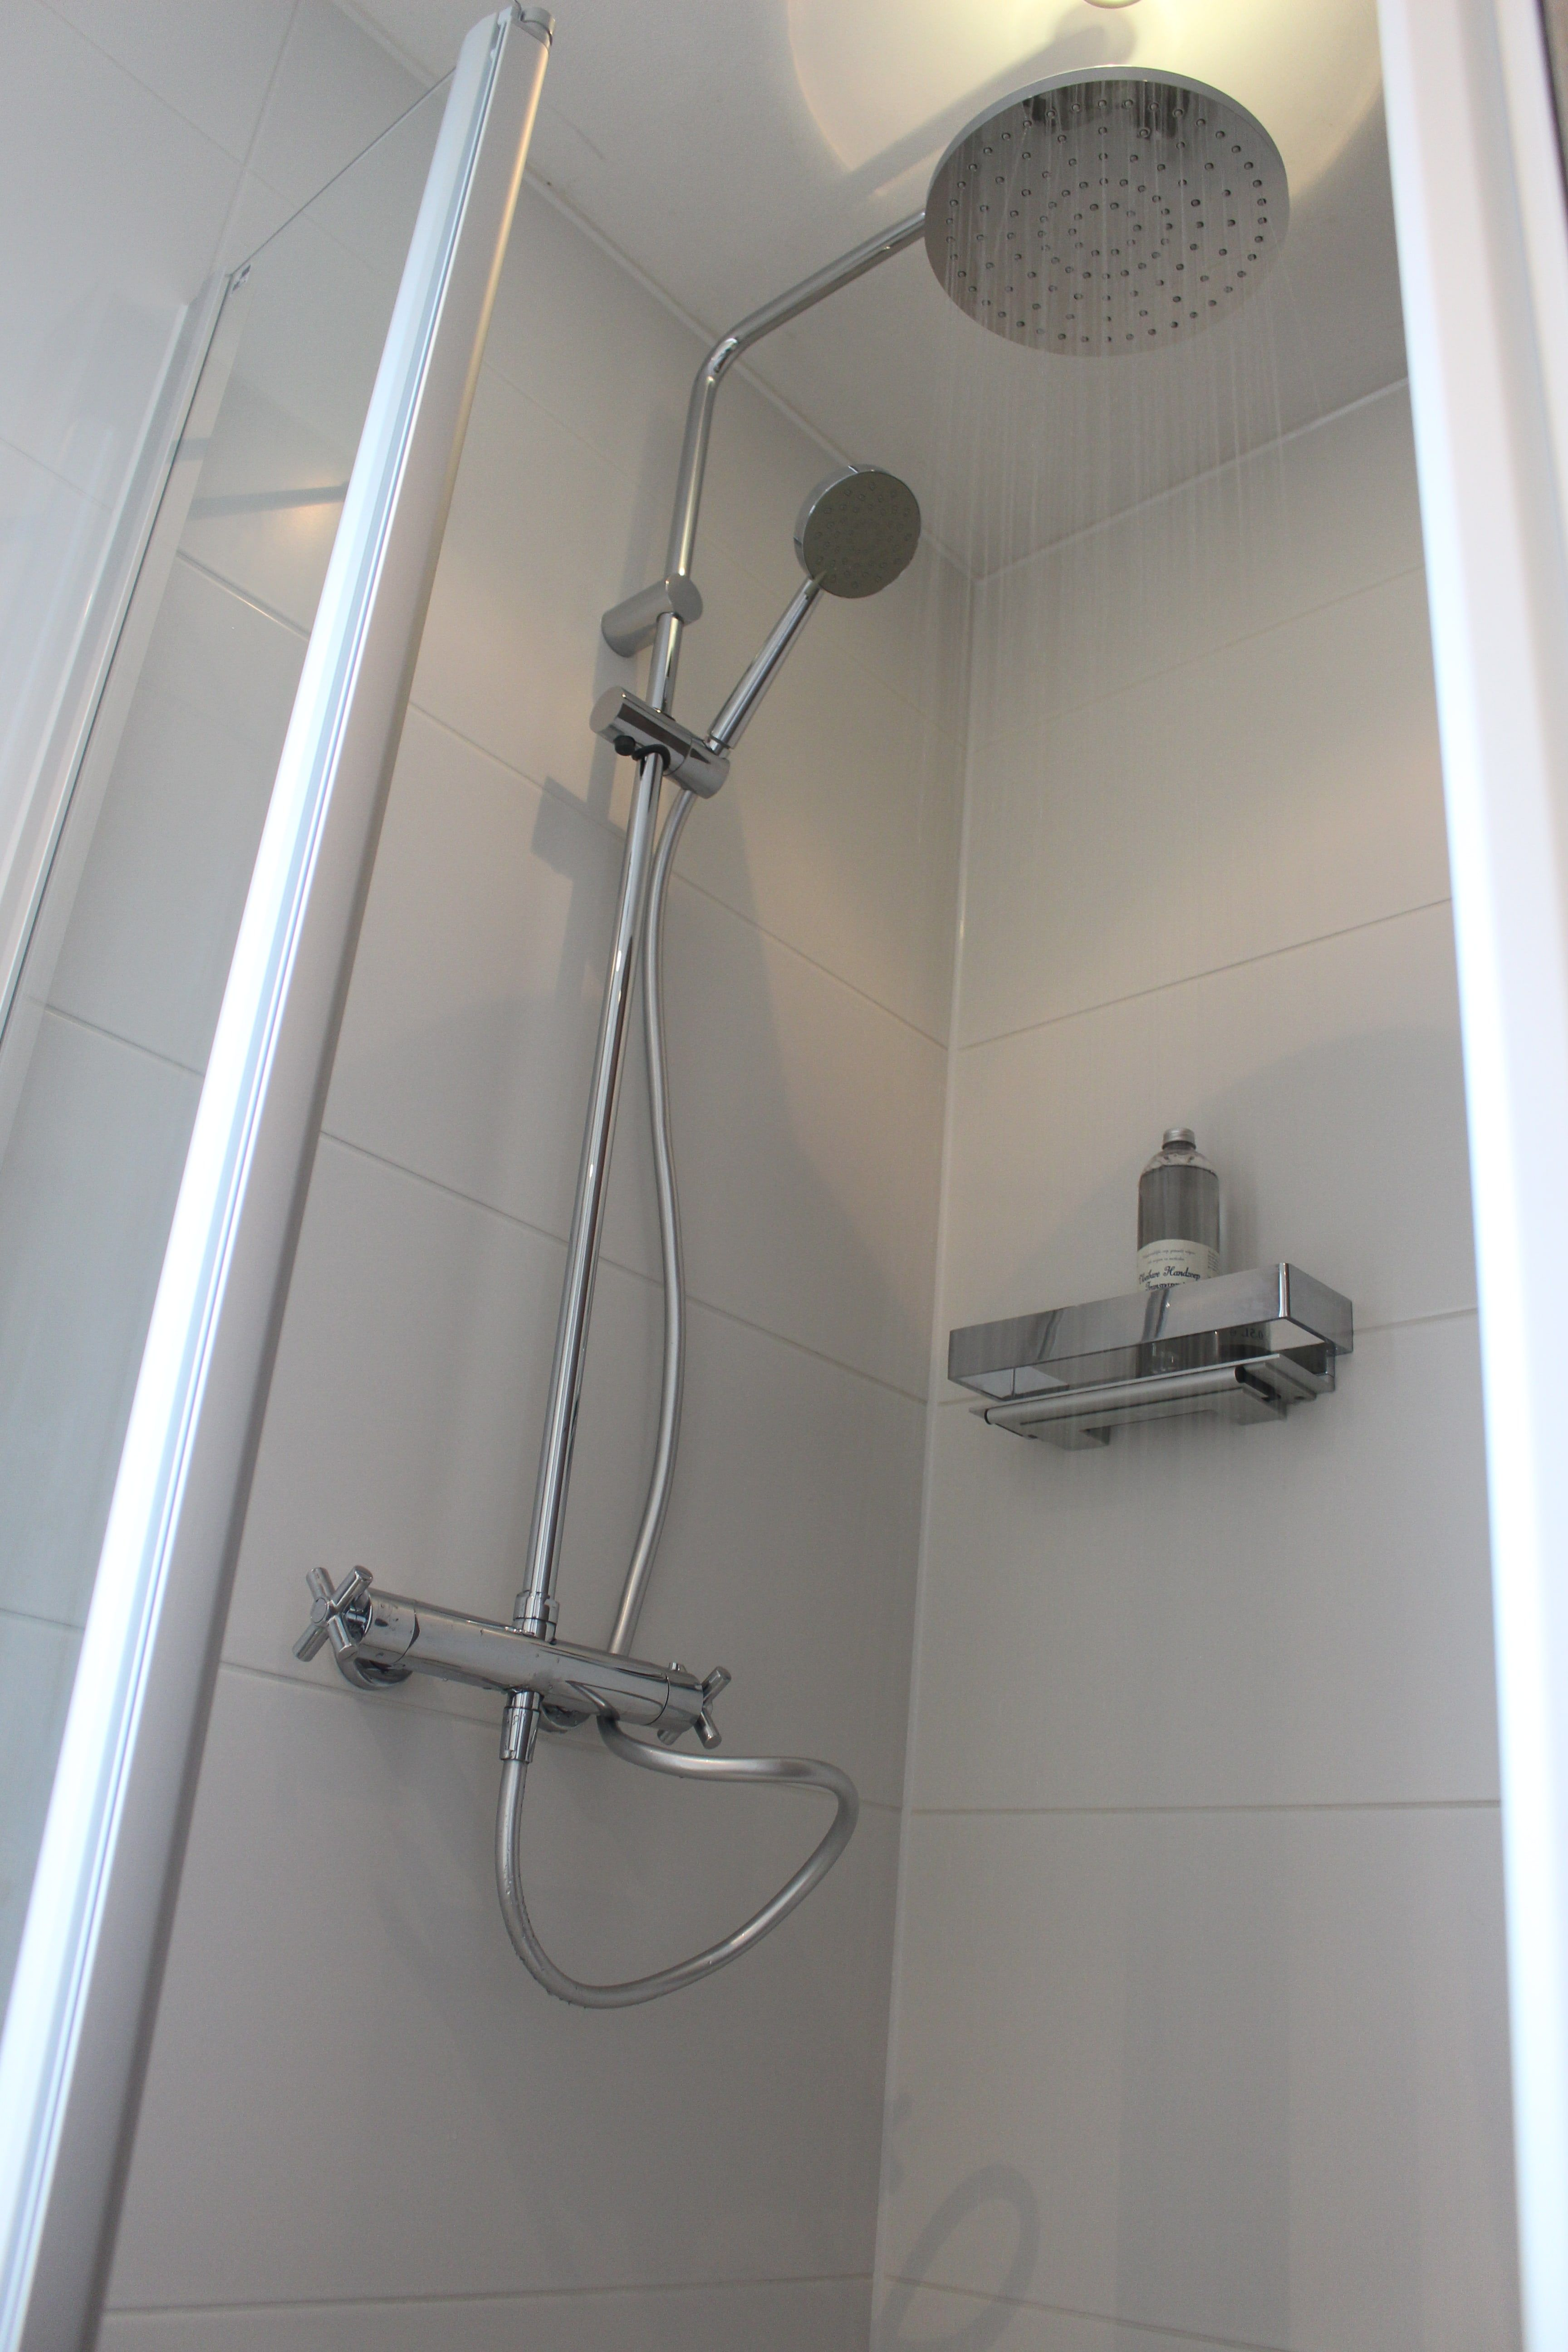 Moderne Regendouche Set Met Strakke Kruisgrepen Badkamer